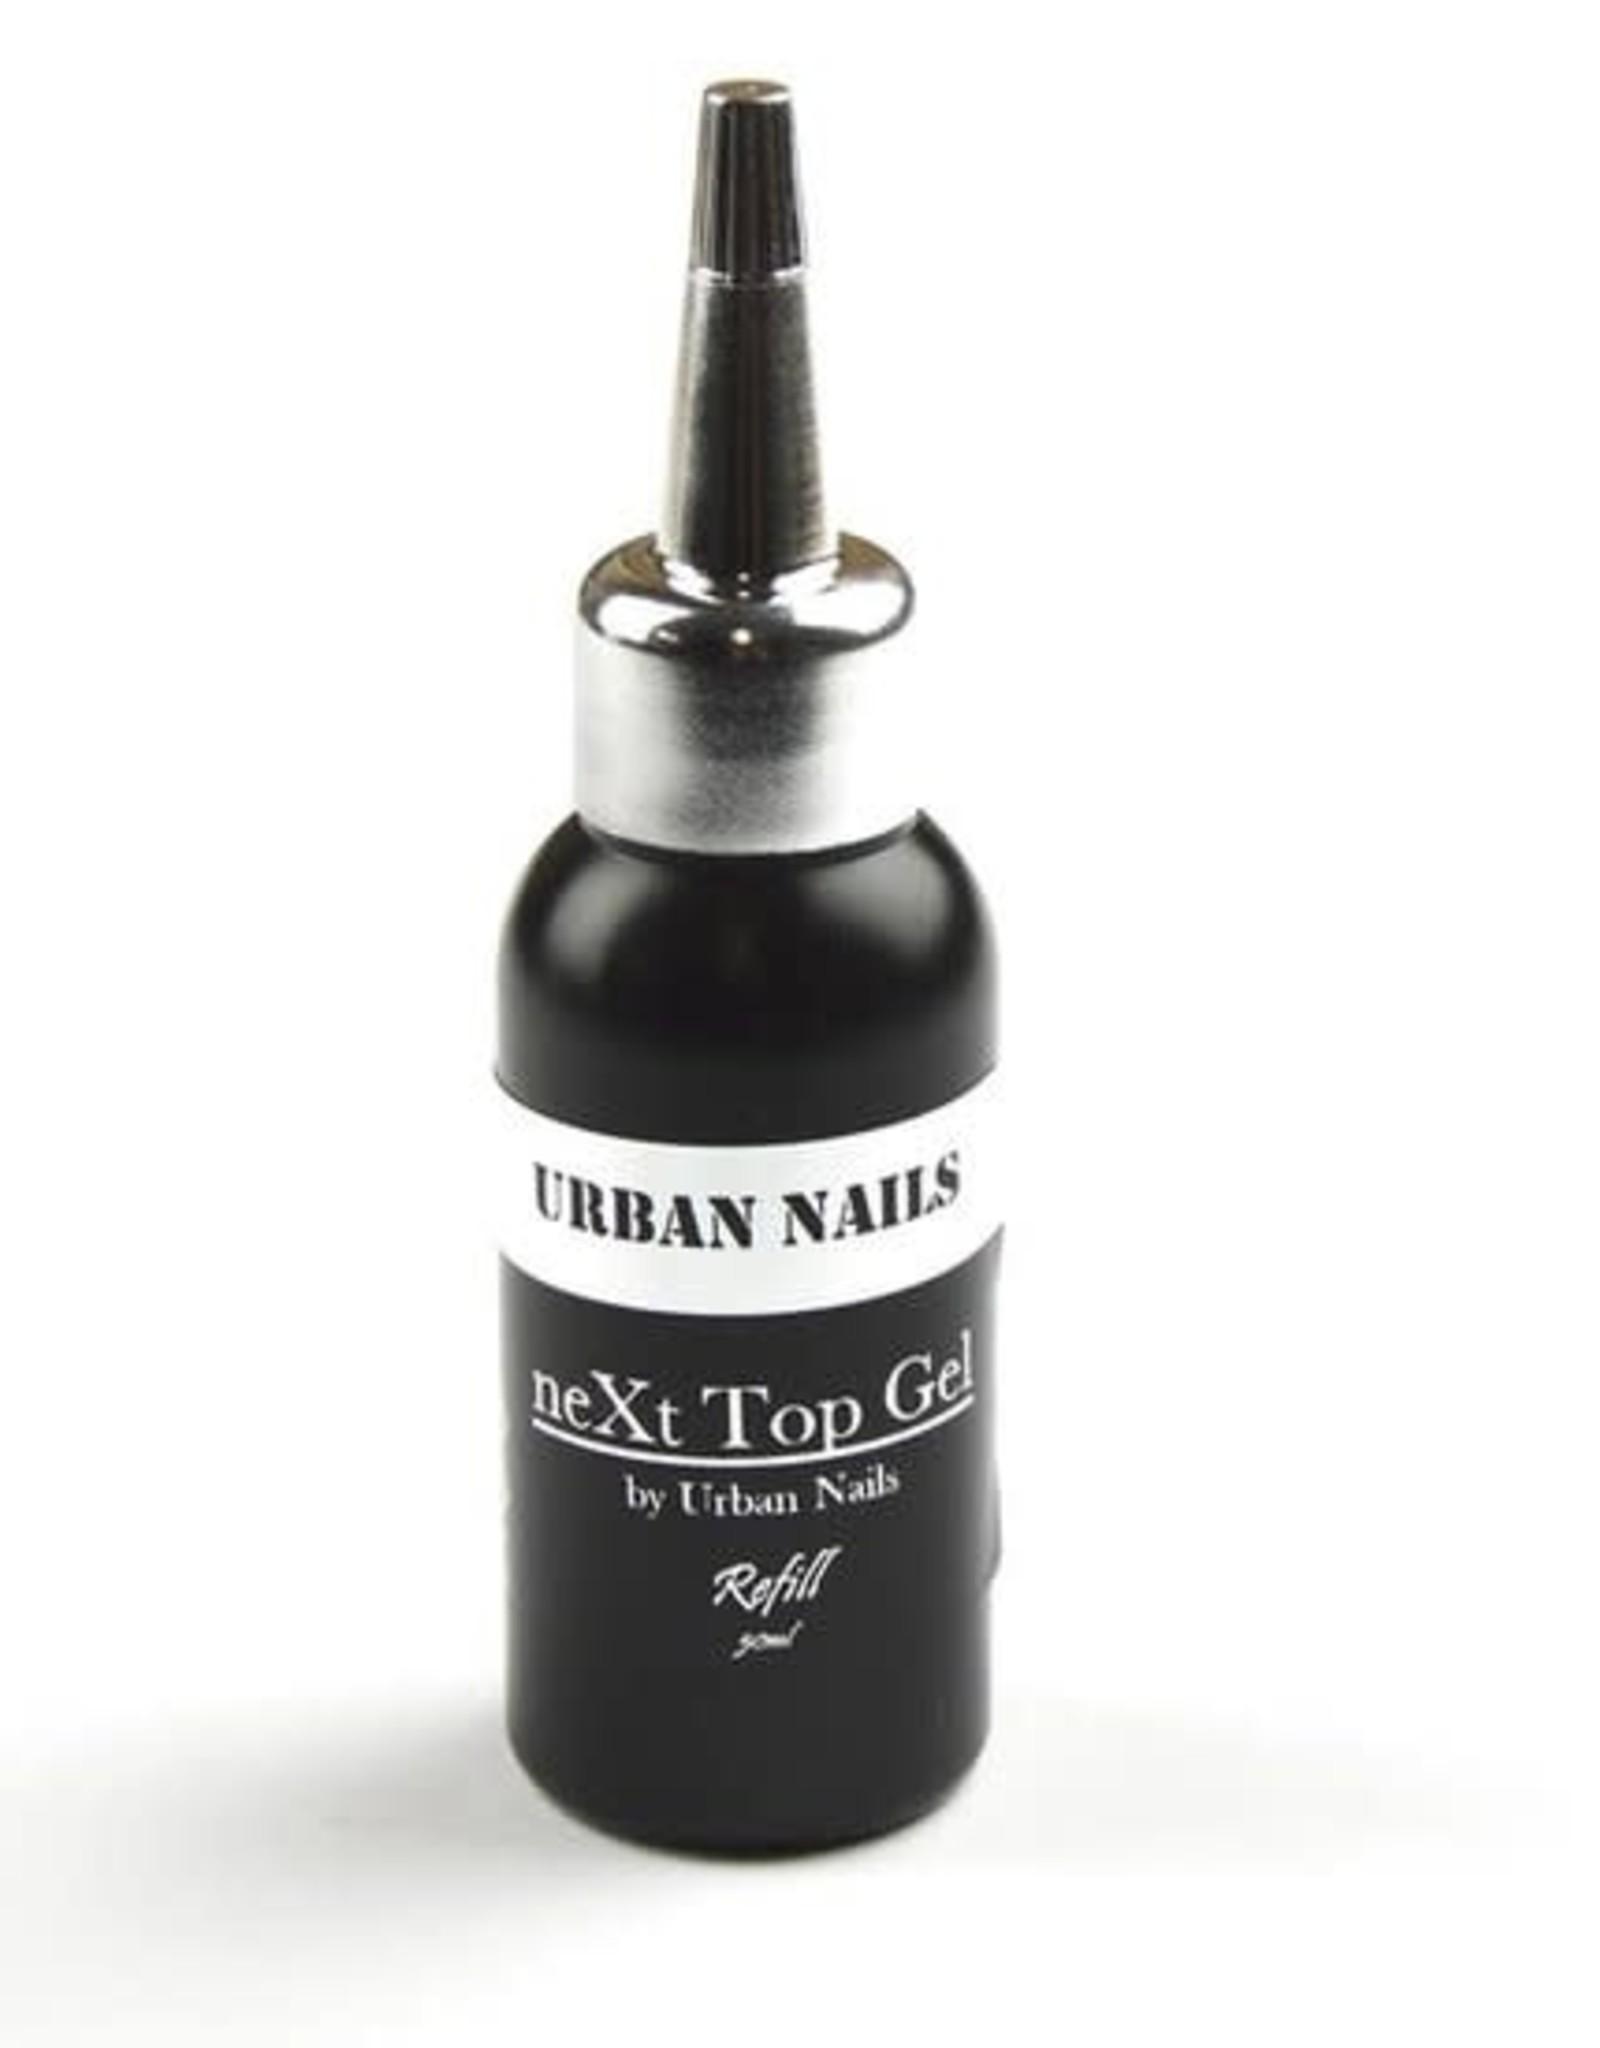 Urban Nails NeXt Top Gel Refill 50ml